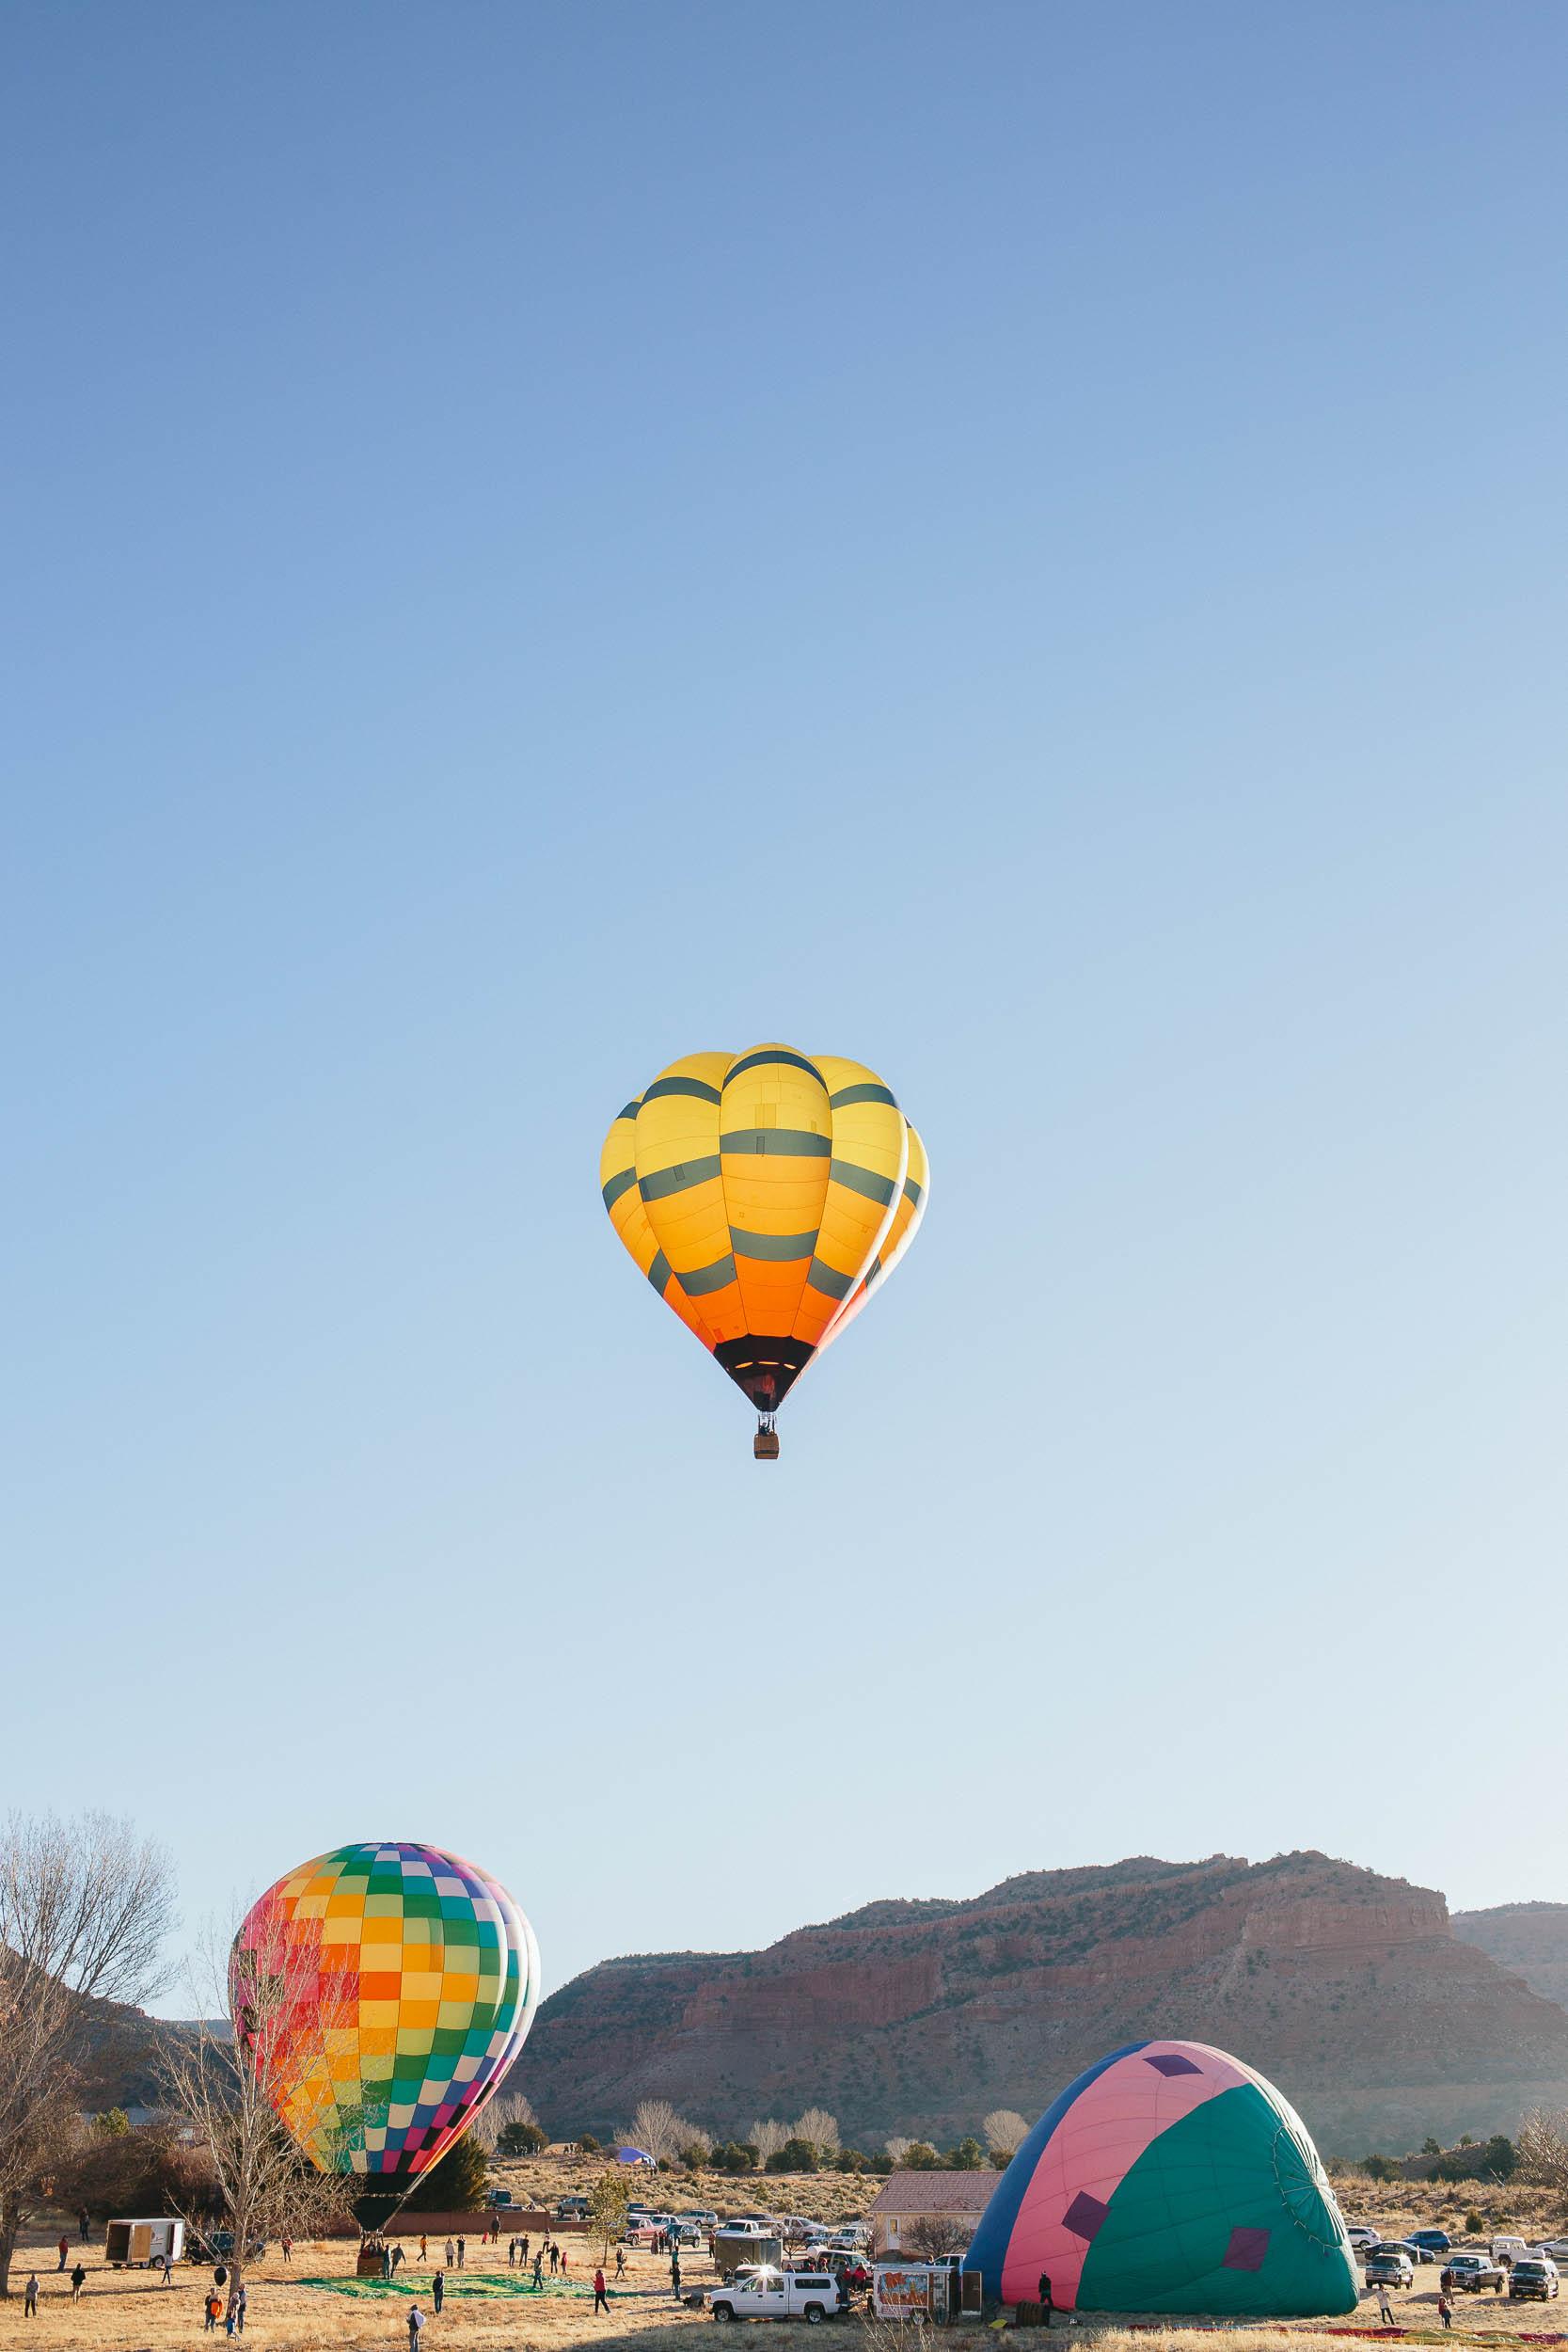 Kyle-Sheppard-Kanab-Balloon-Festival-21.jpg